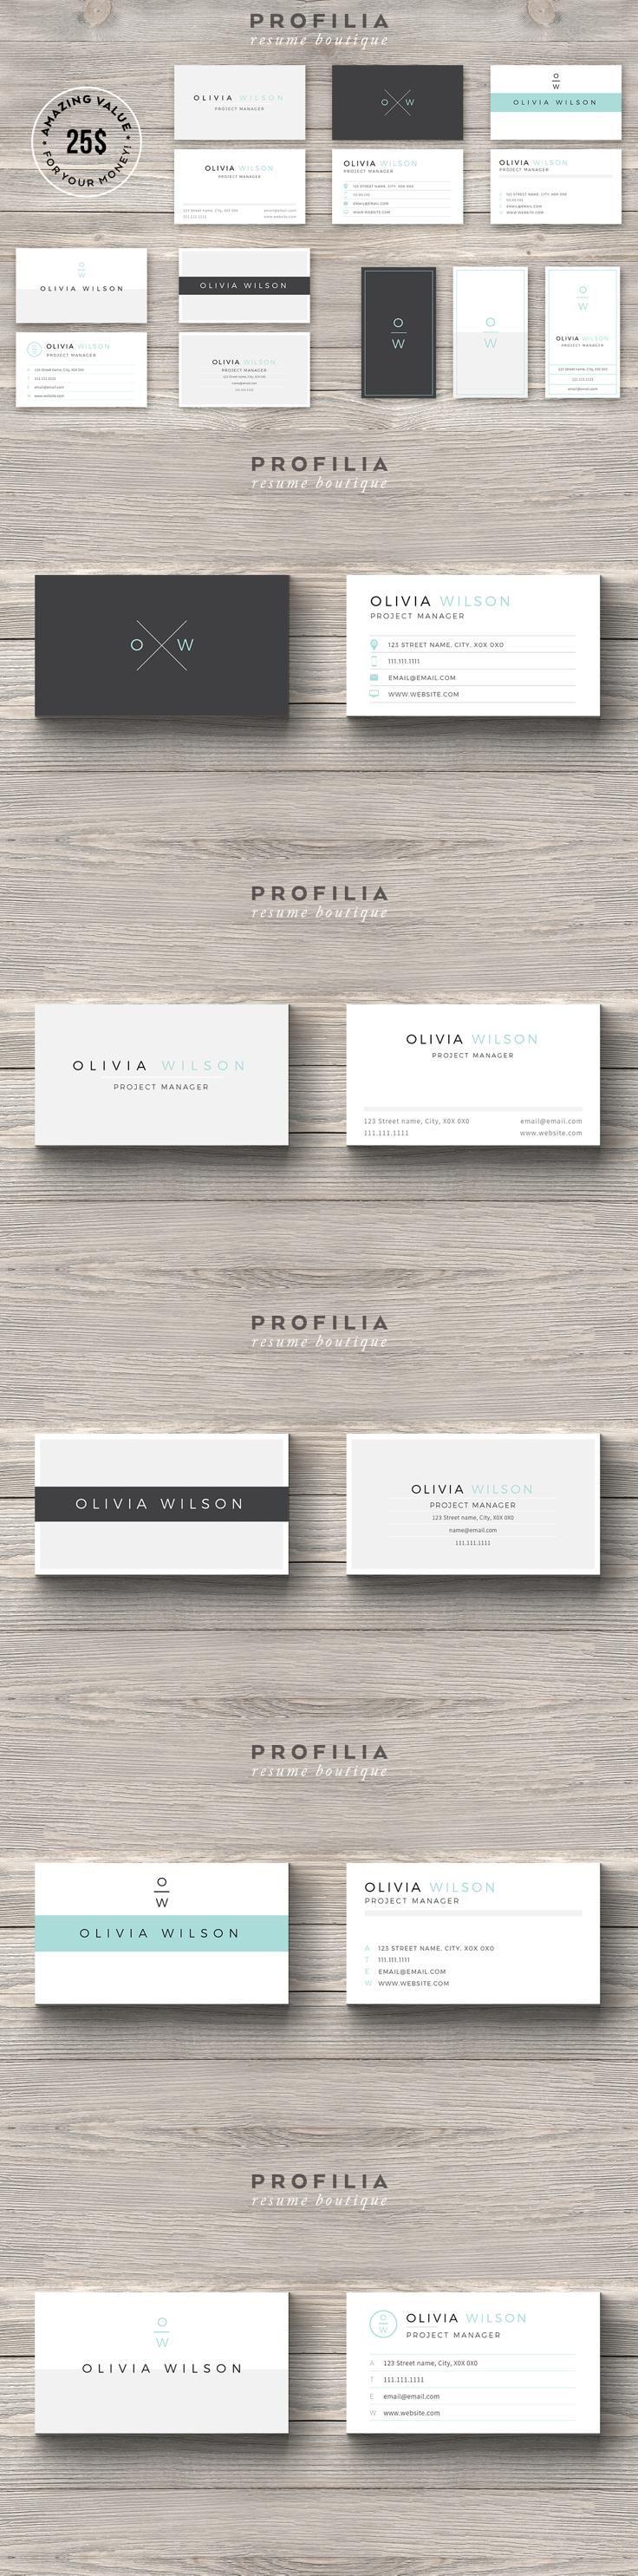 #businesscard #design from Profilia Resume Boutique | DOWNLOAD: creativemarket.c...